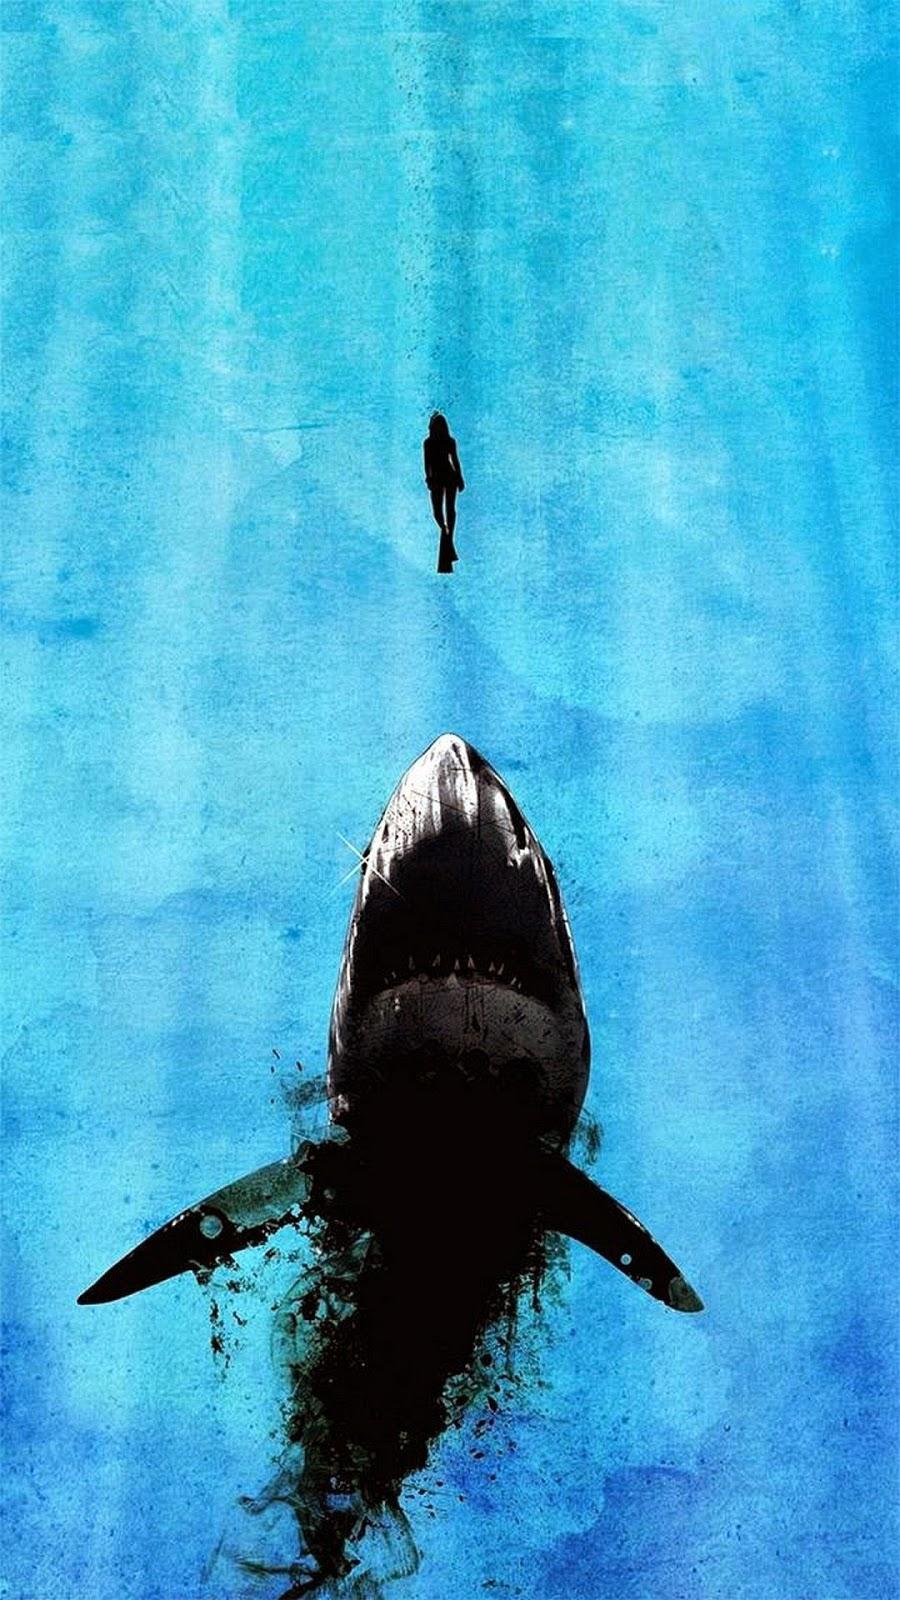 iPhone 6 Plus Shark Background